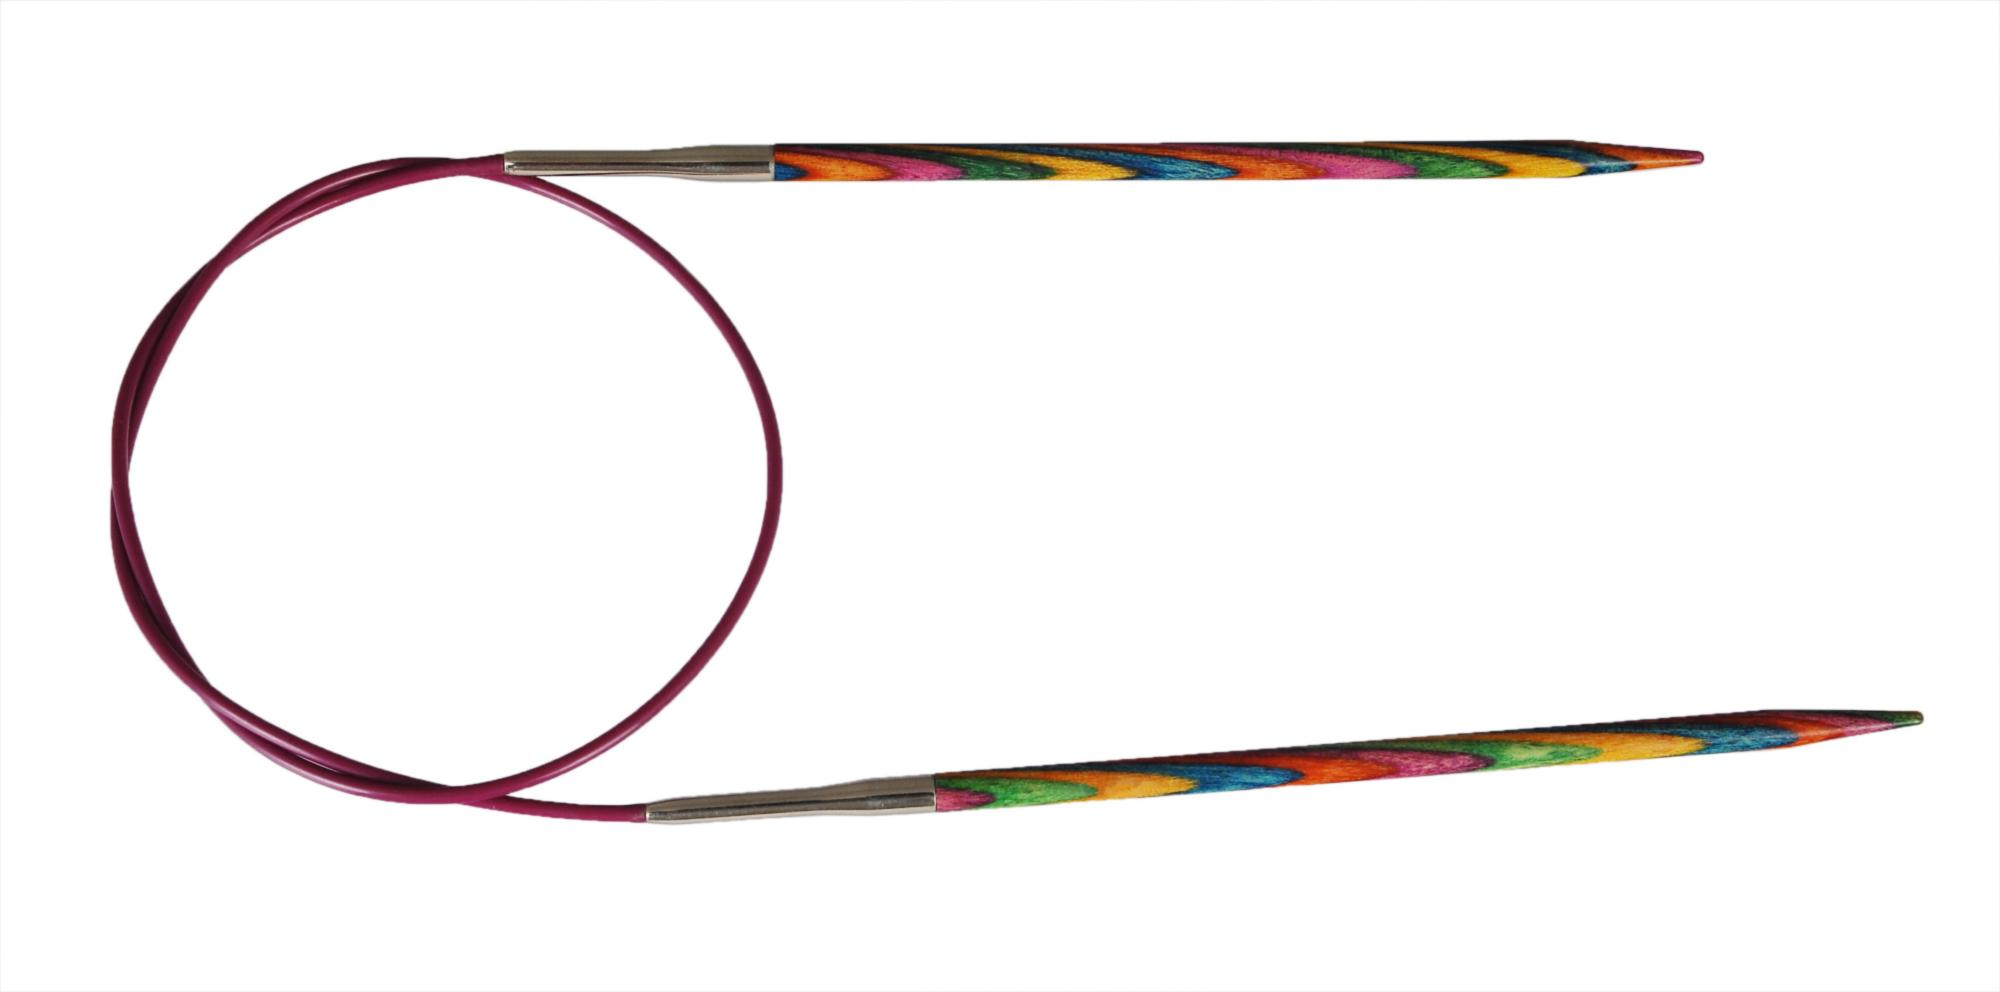 Спицы круговые 60 см Symfonie Wood KnitPro, 21325, 5.50 мм